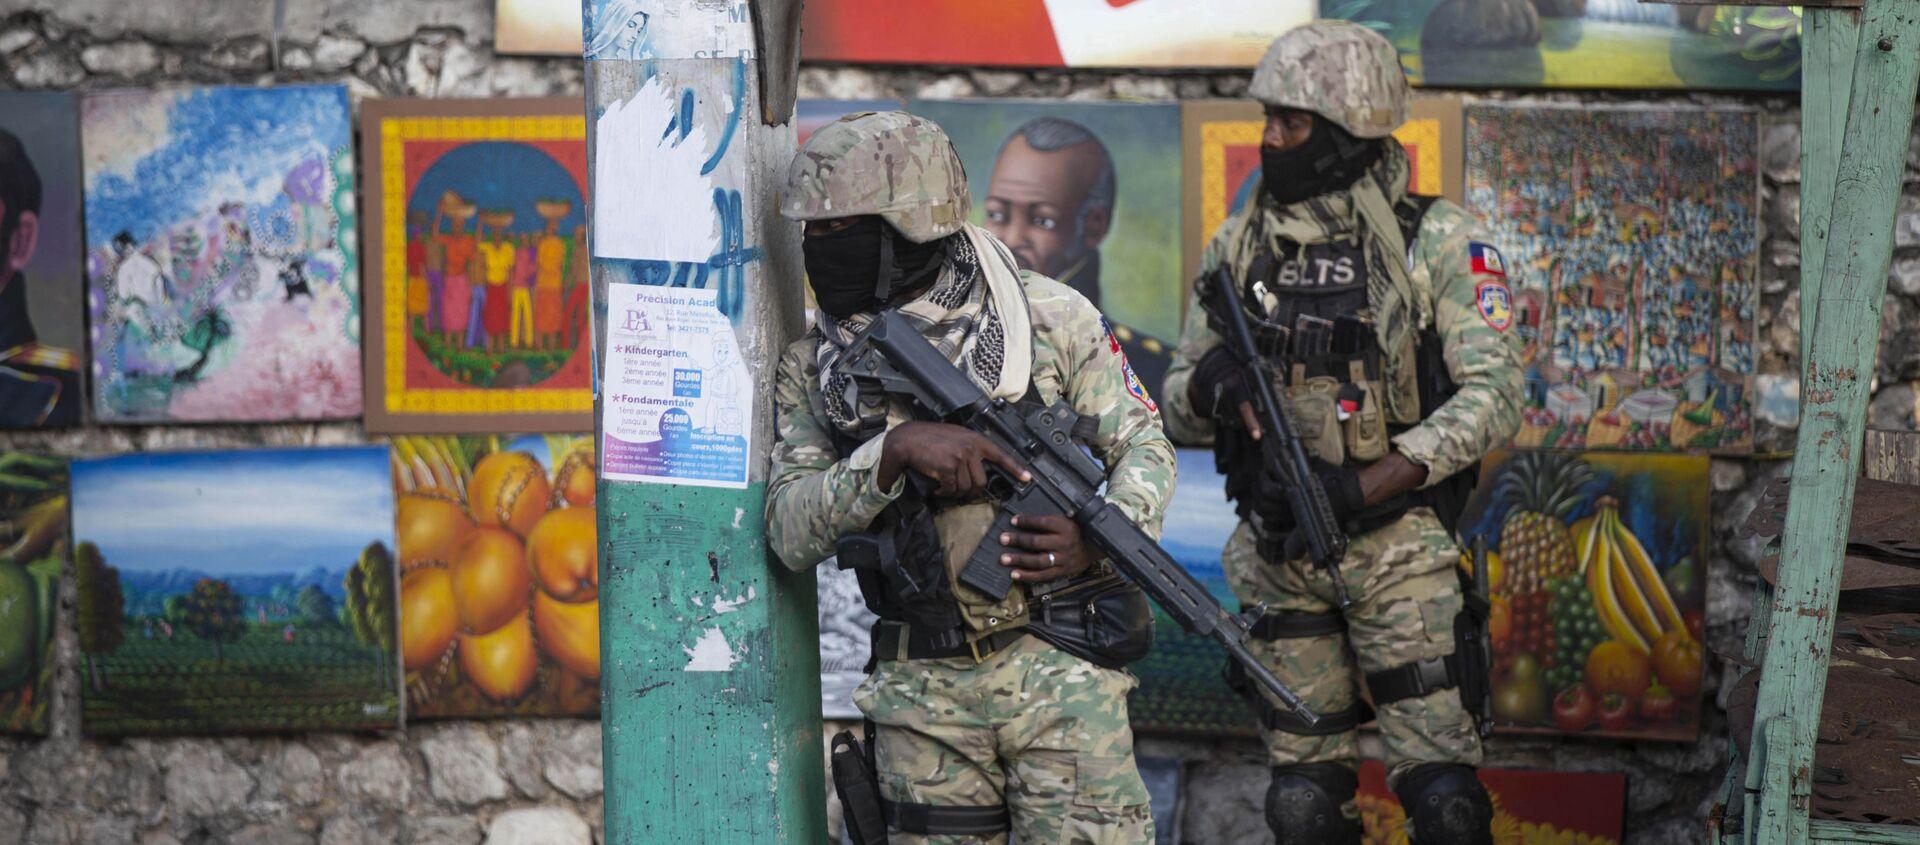 Các binh sĩ tuần tra Petion Ville, khu vực nơi cố Tổng thống Haiti Jovenel Moise sinh sống, ở Port-au-Prince, Haiti - Sputnik Việt Nam, 1920, 09.07.2021